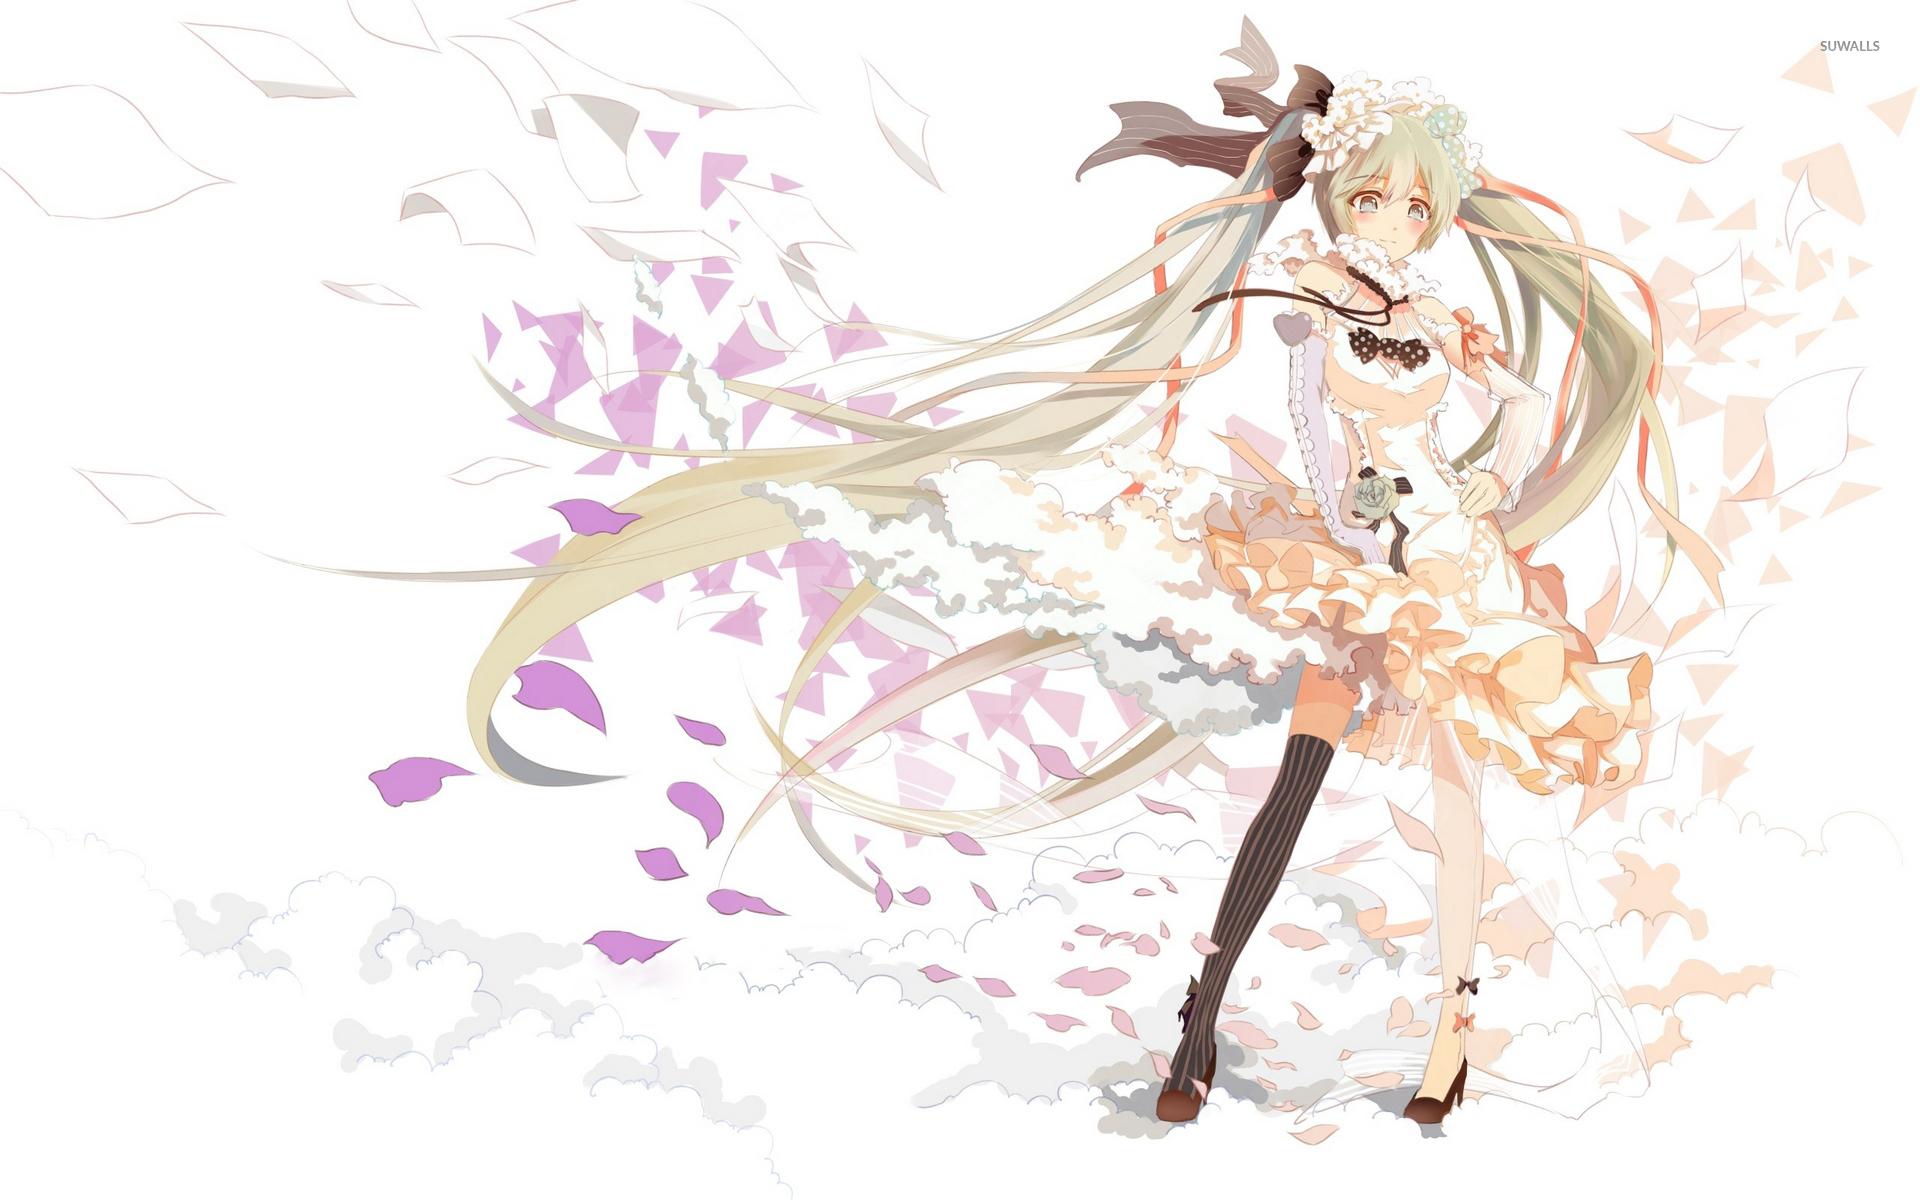 hatsune miku wallpaper outfits - photo #40